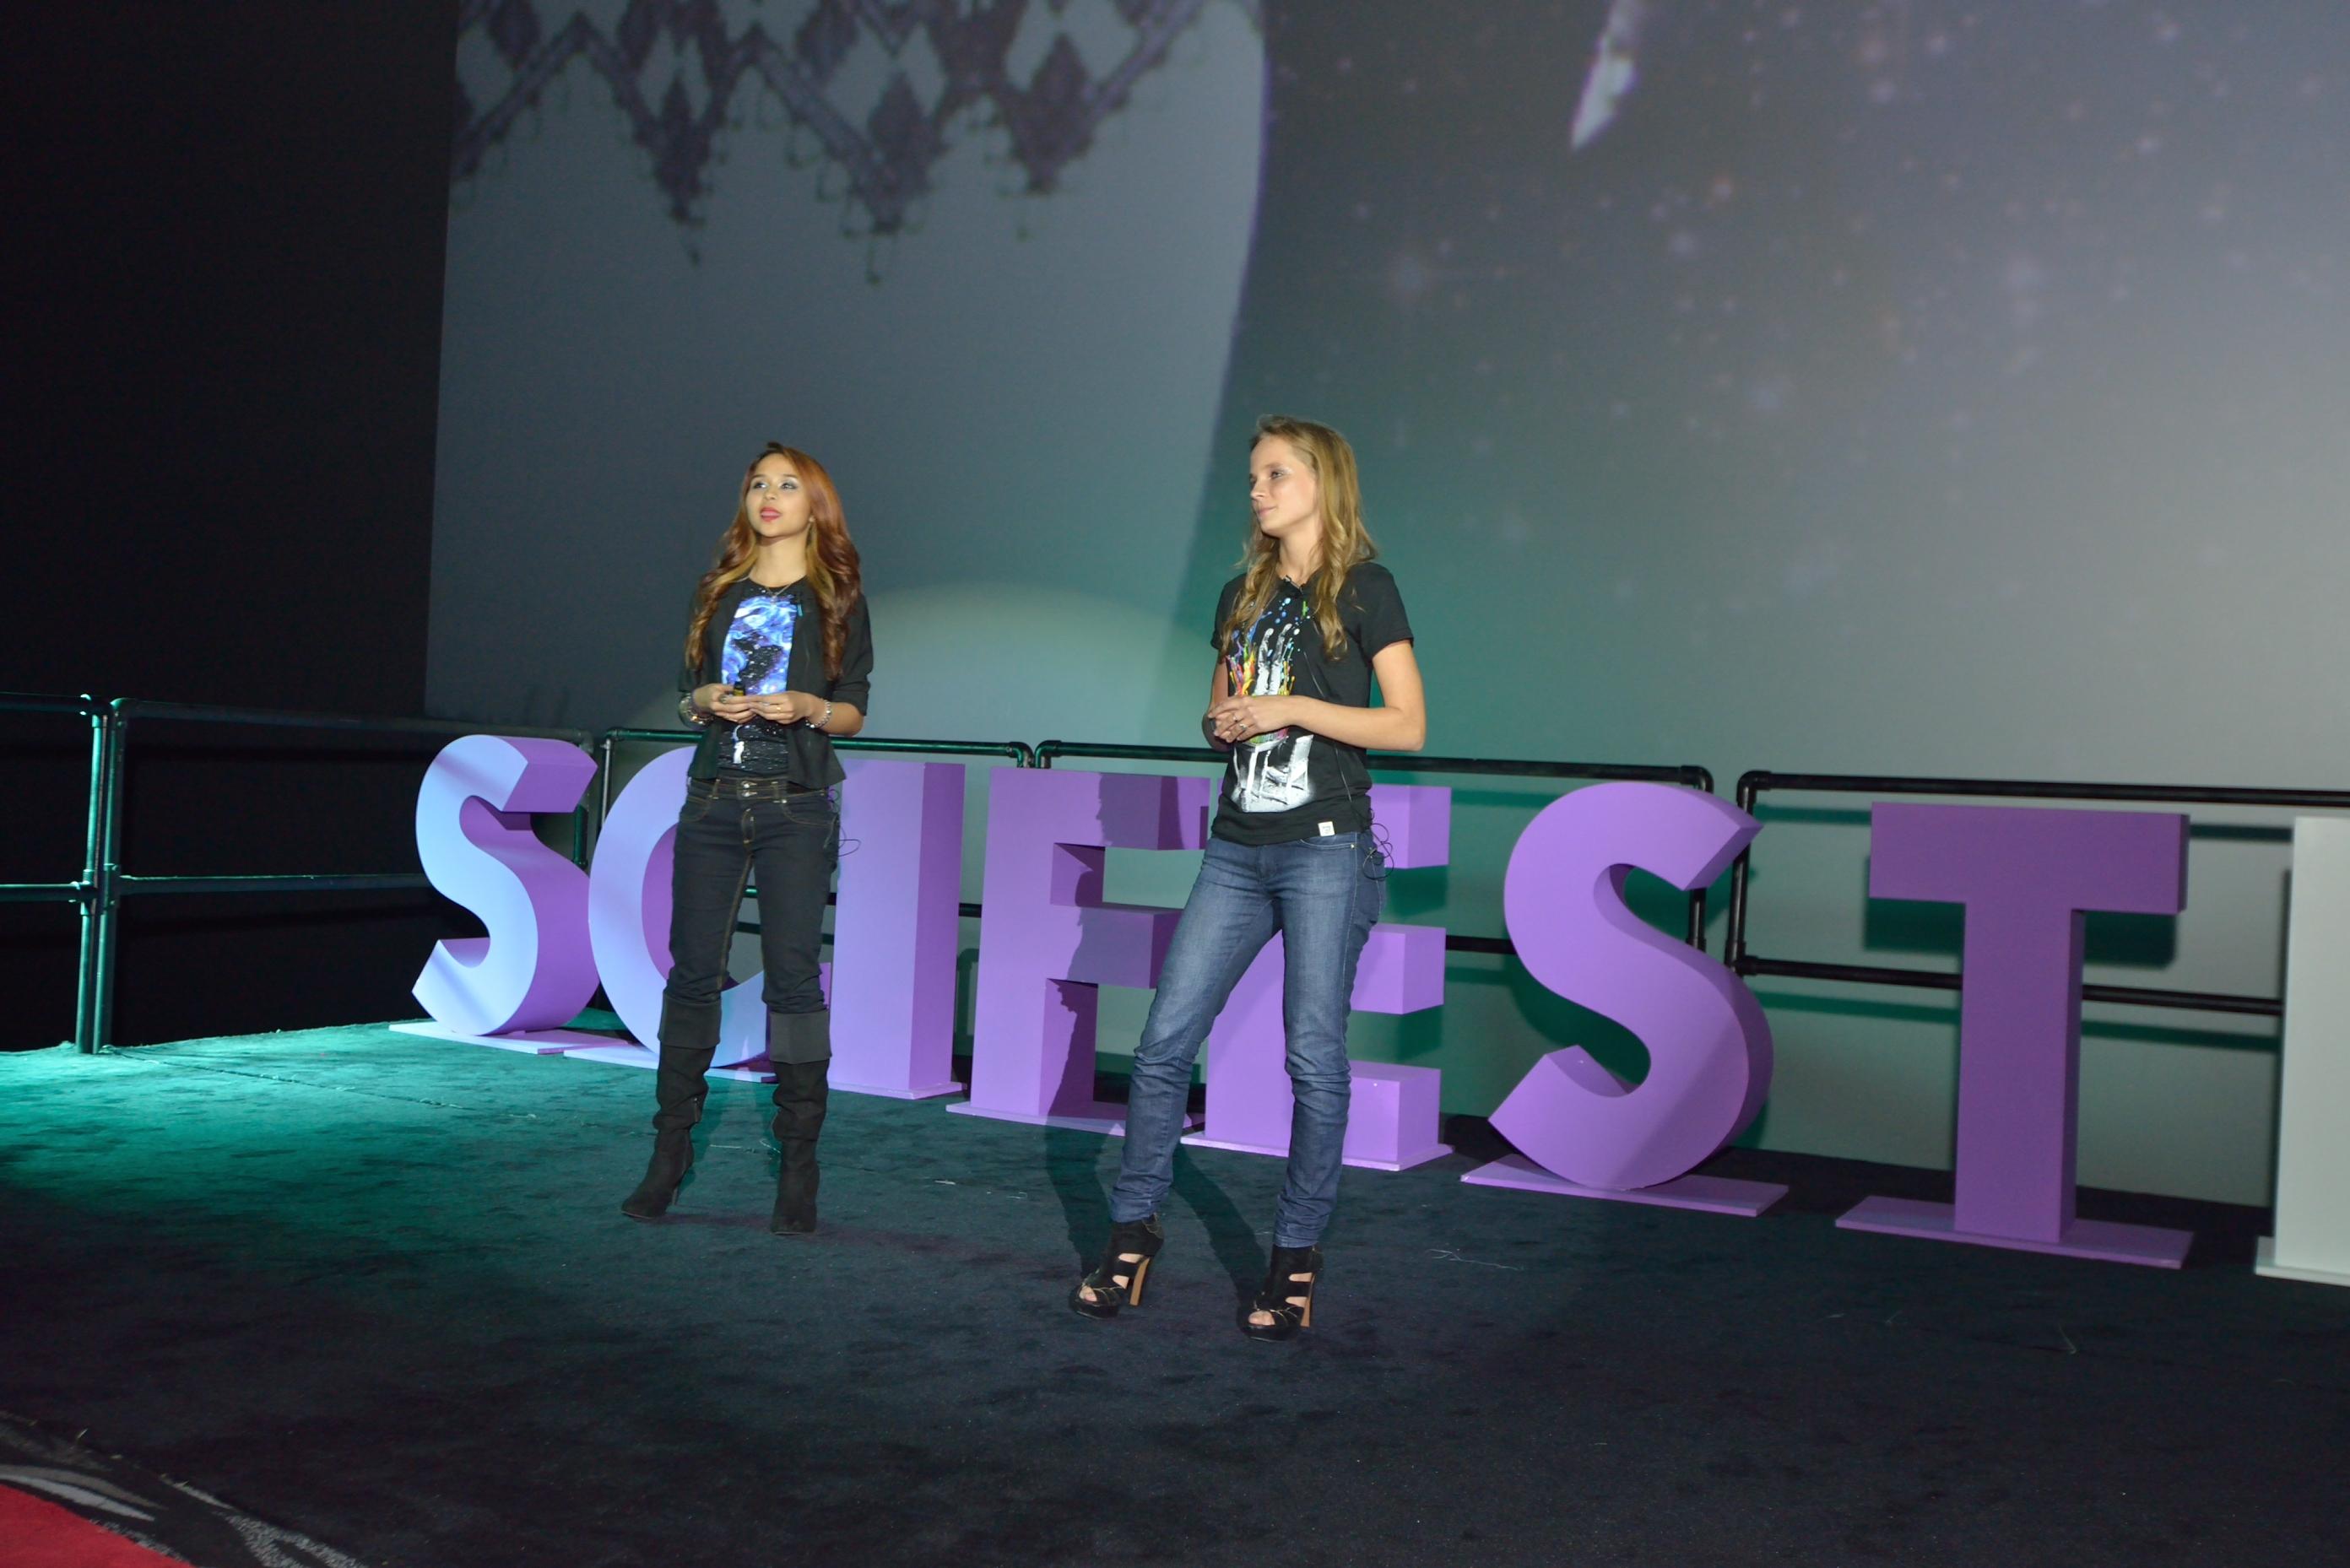 jonerona 2014_02_26 188 SciFest Dubai.JPG